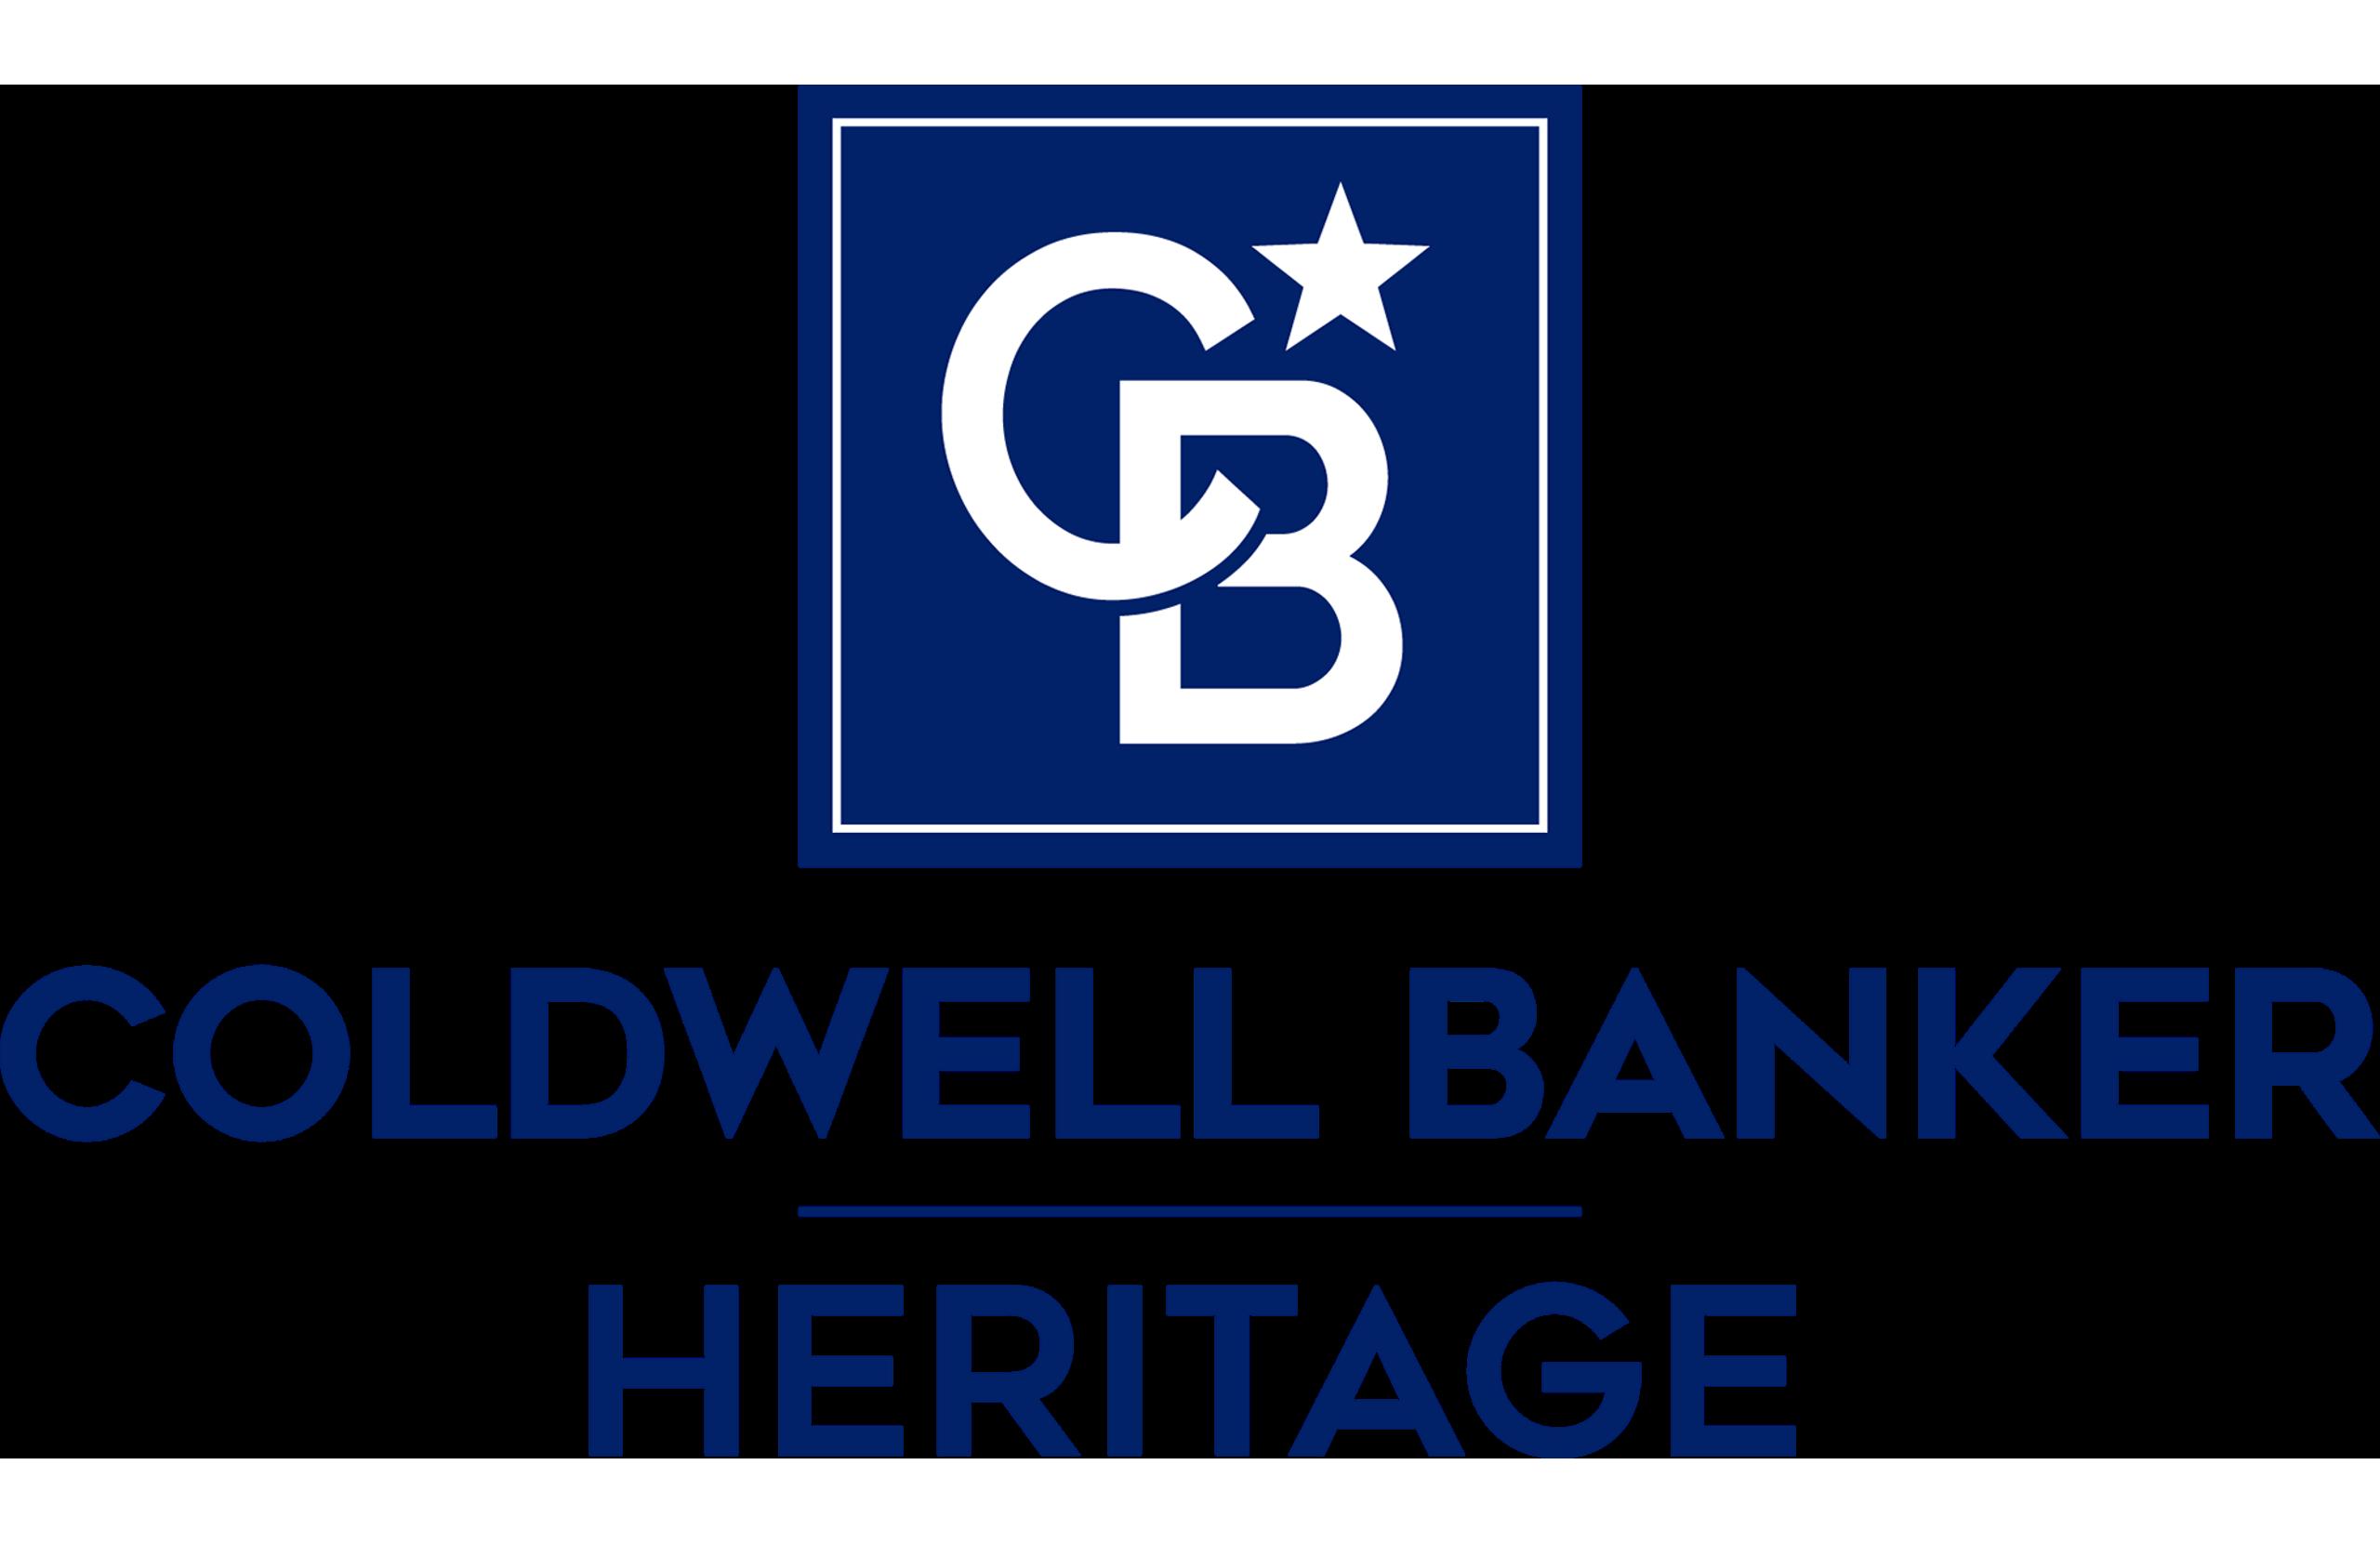 Karen Powell - Coldwell Banker Heritage Logo